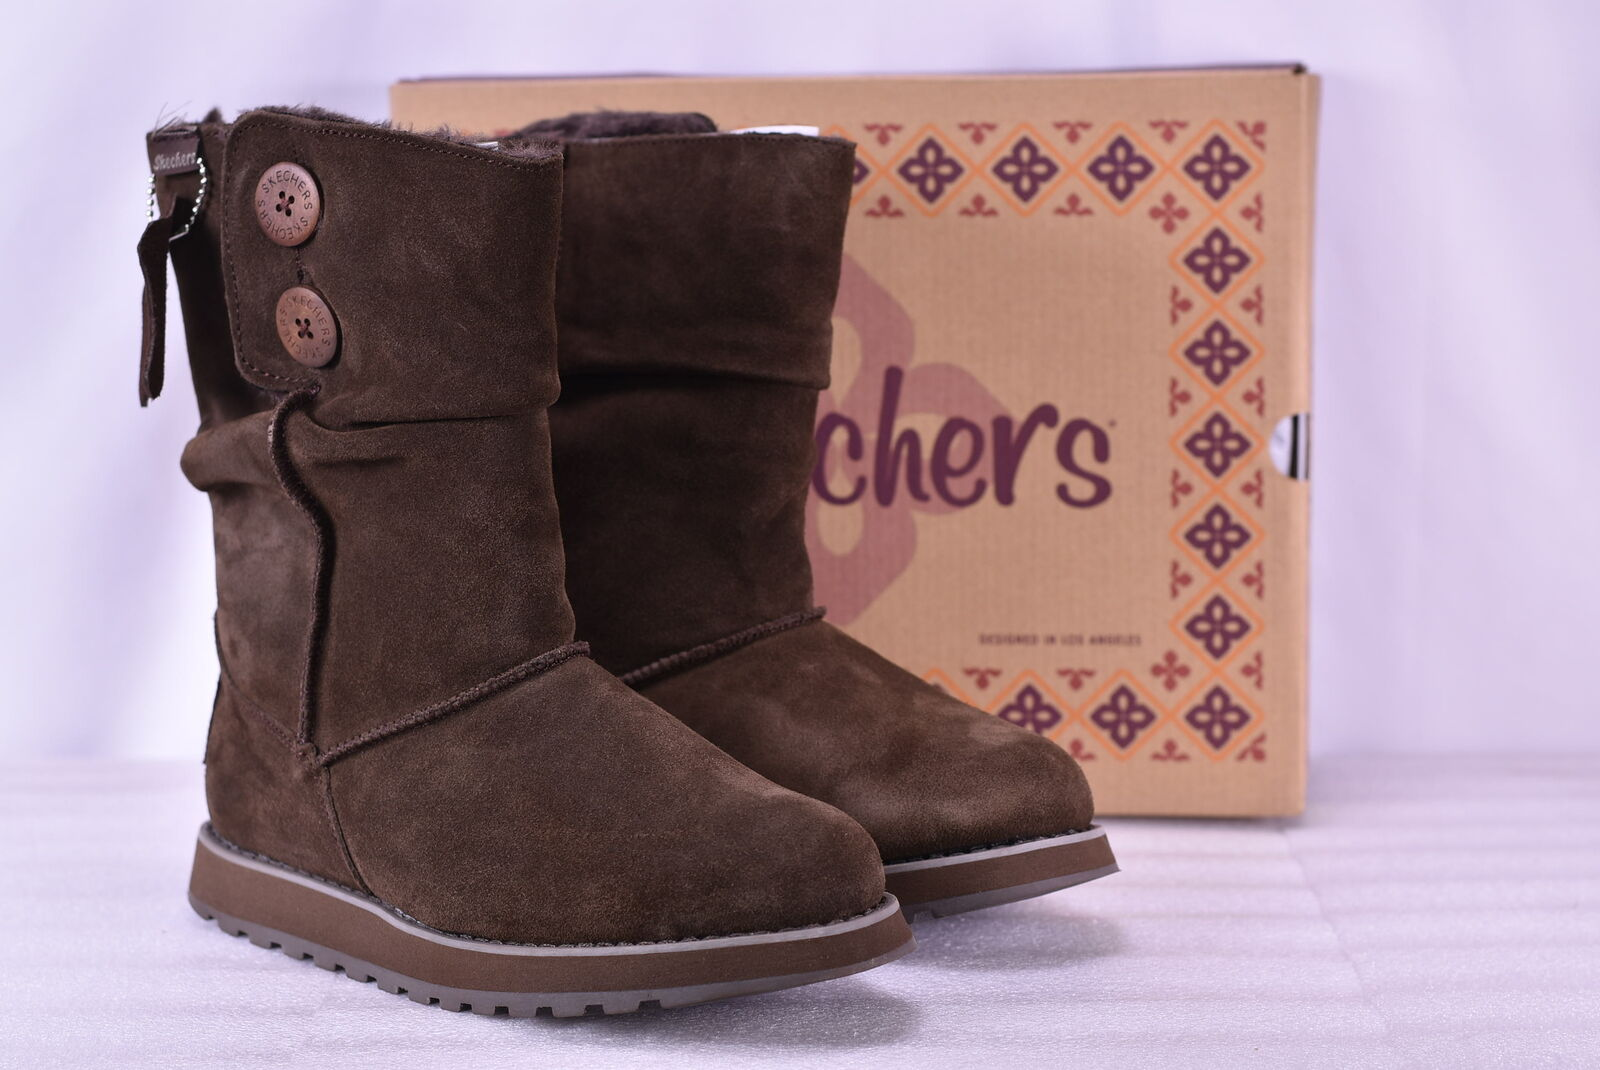 Women's Skechers Keepsakes-Freezing Temps Boots Chocolate 5